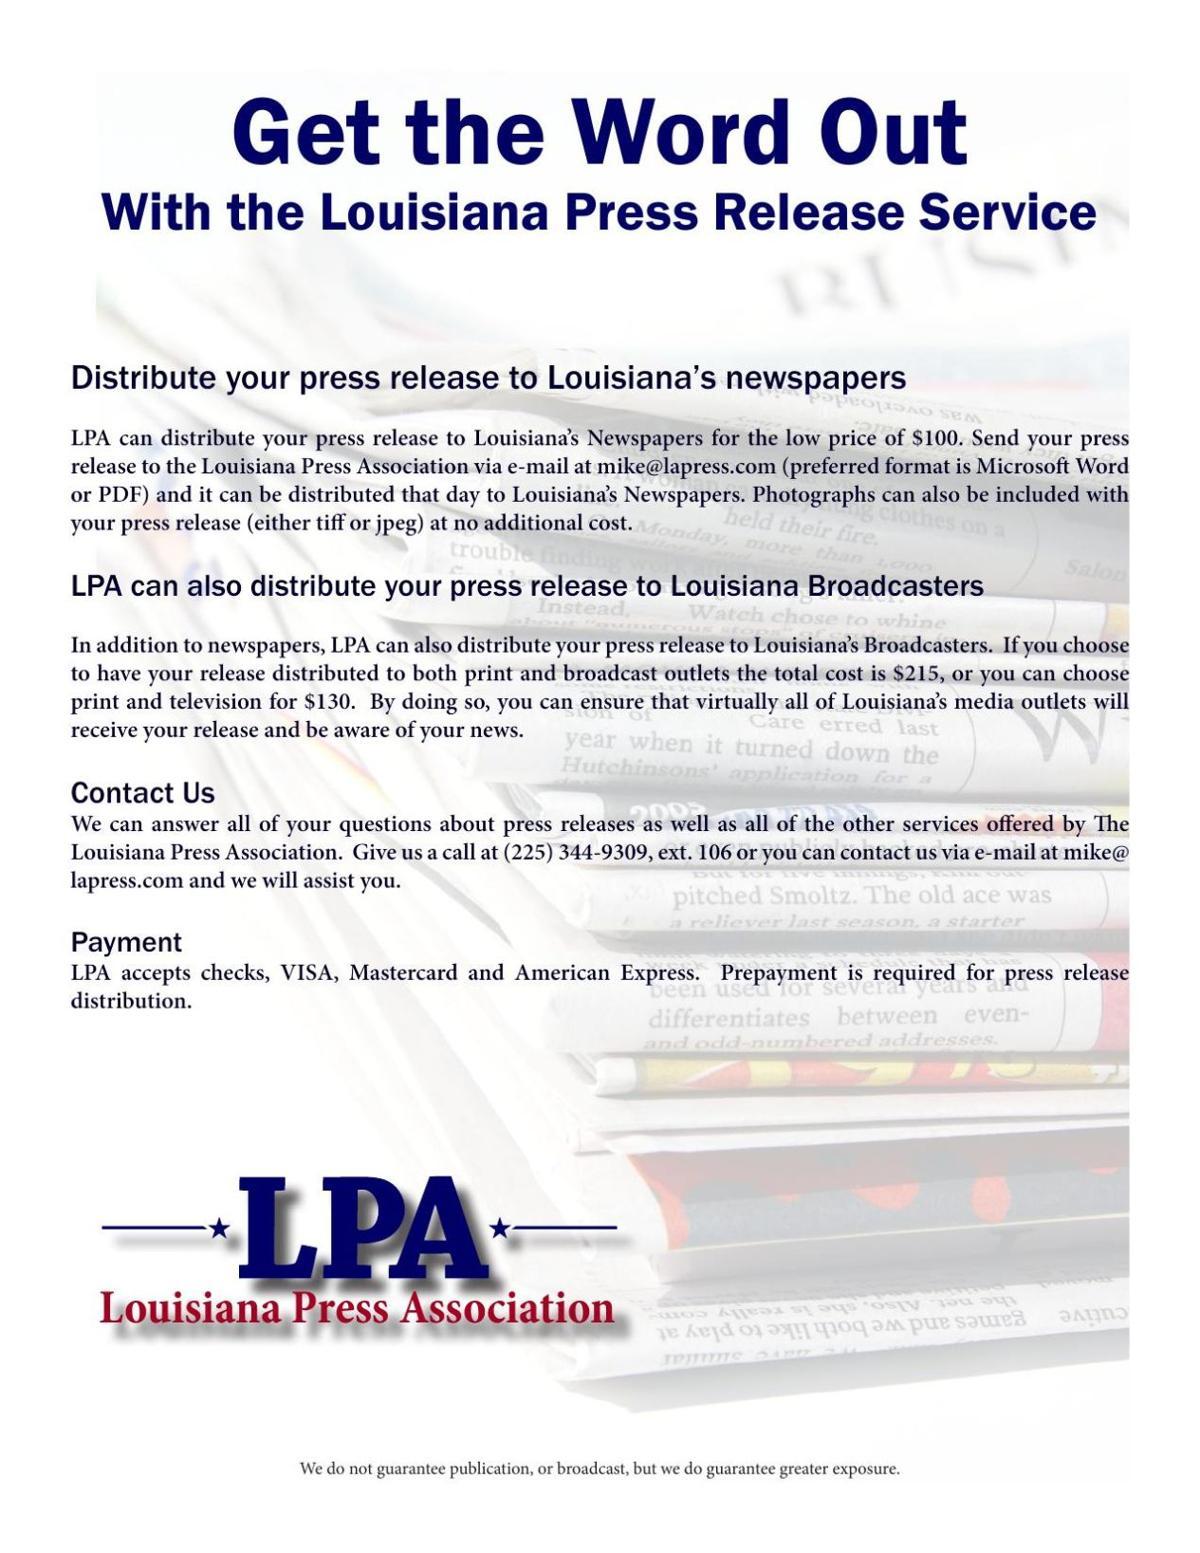 Louisiana Press Release Service